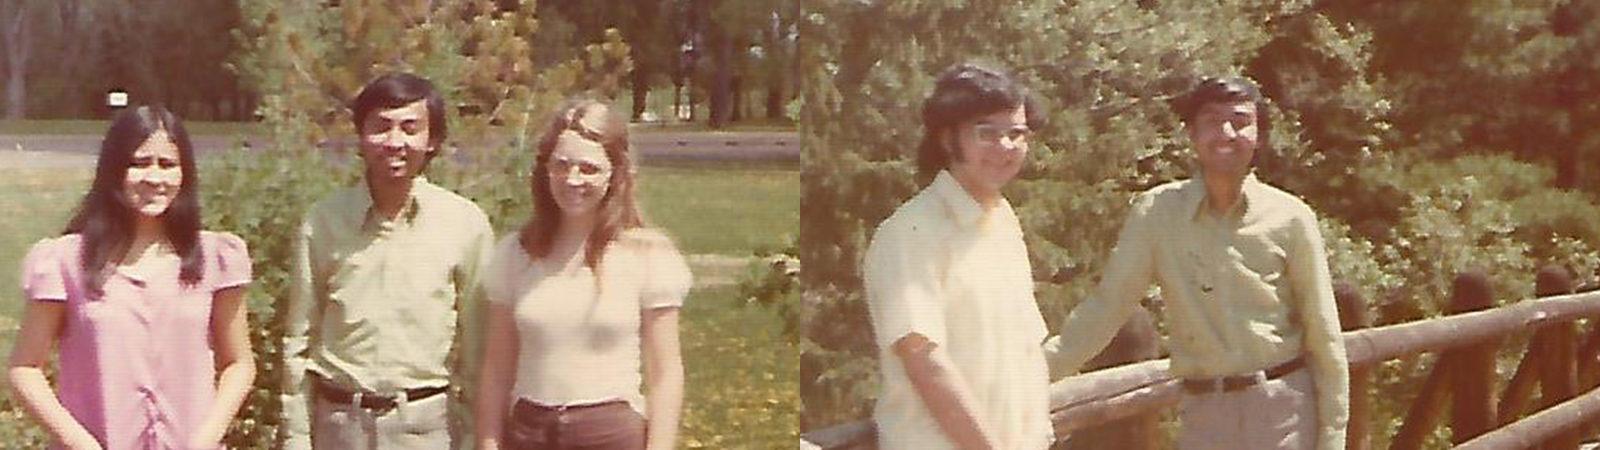 Northland College 1970s alumni